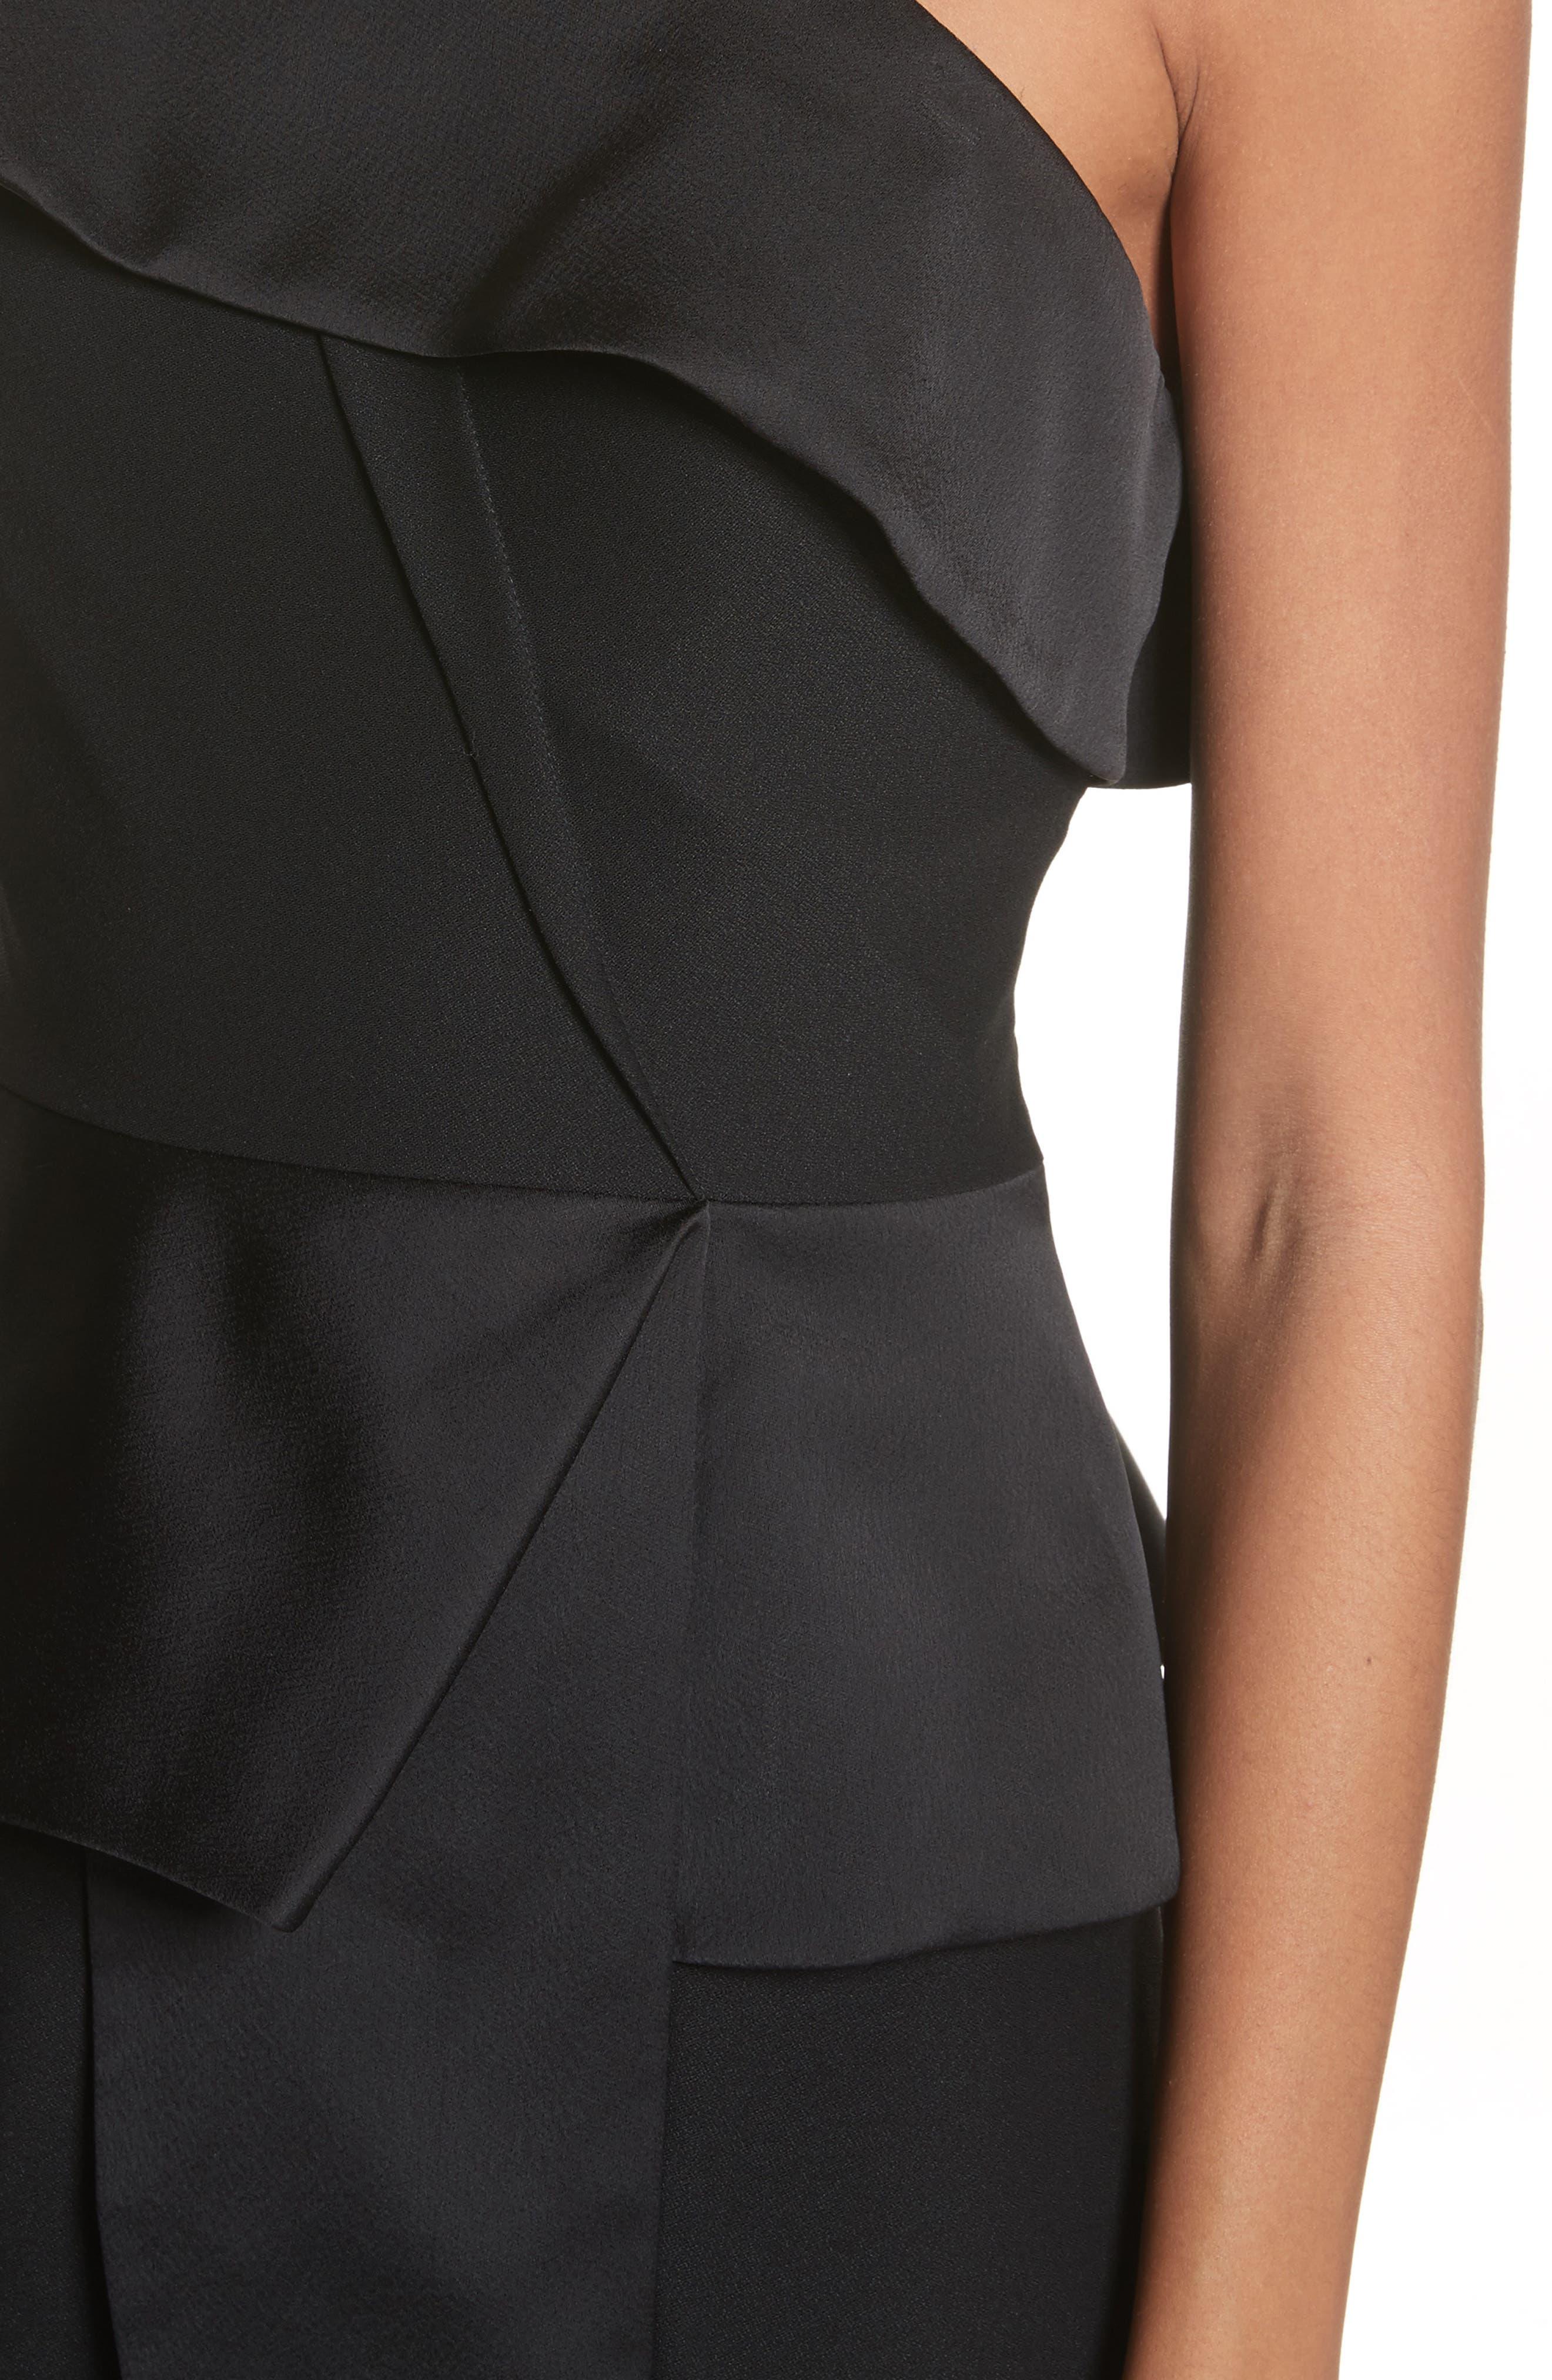 Pana One-Shoulder Peplum Sheath Dress,                             Alternate thumbnail 4, color,                             001